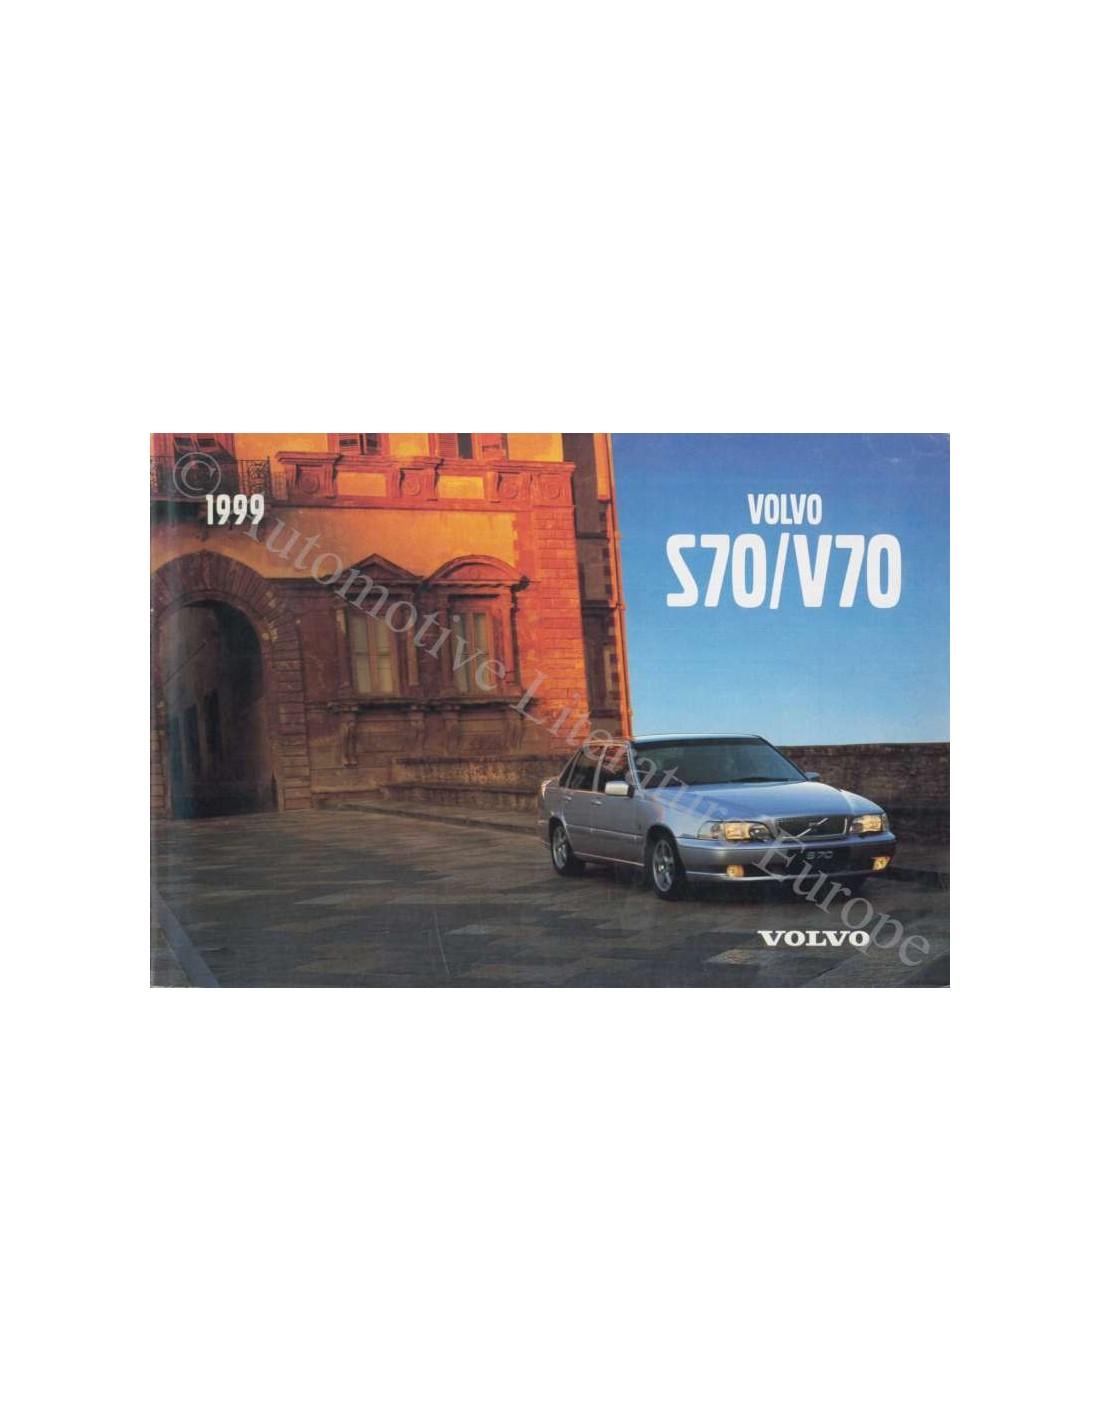 1999 volvo s70 v70 owner s manual english rh autolit eu 1999 volvo v70 repair manual 1999 volvo v70 owners manual pdf